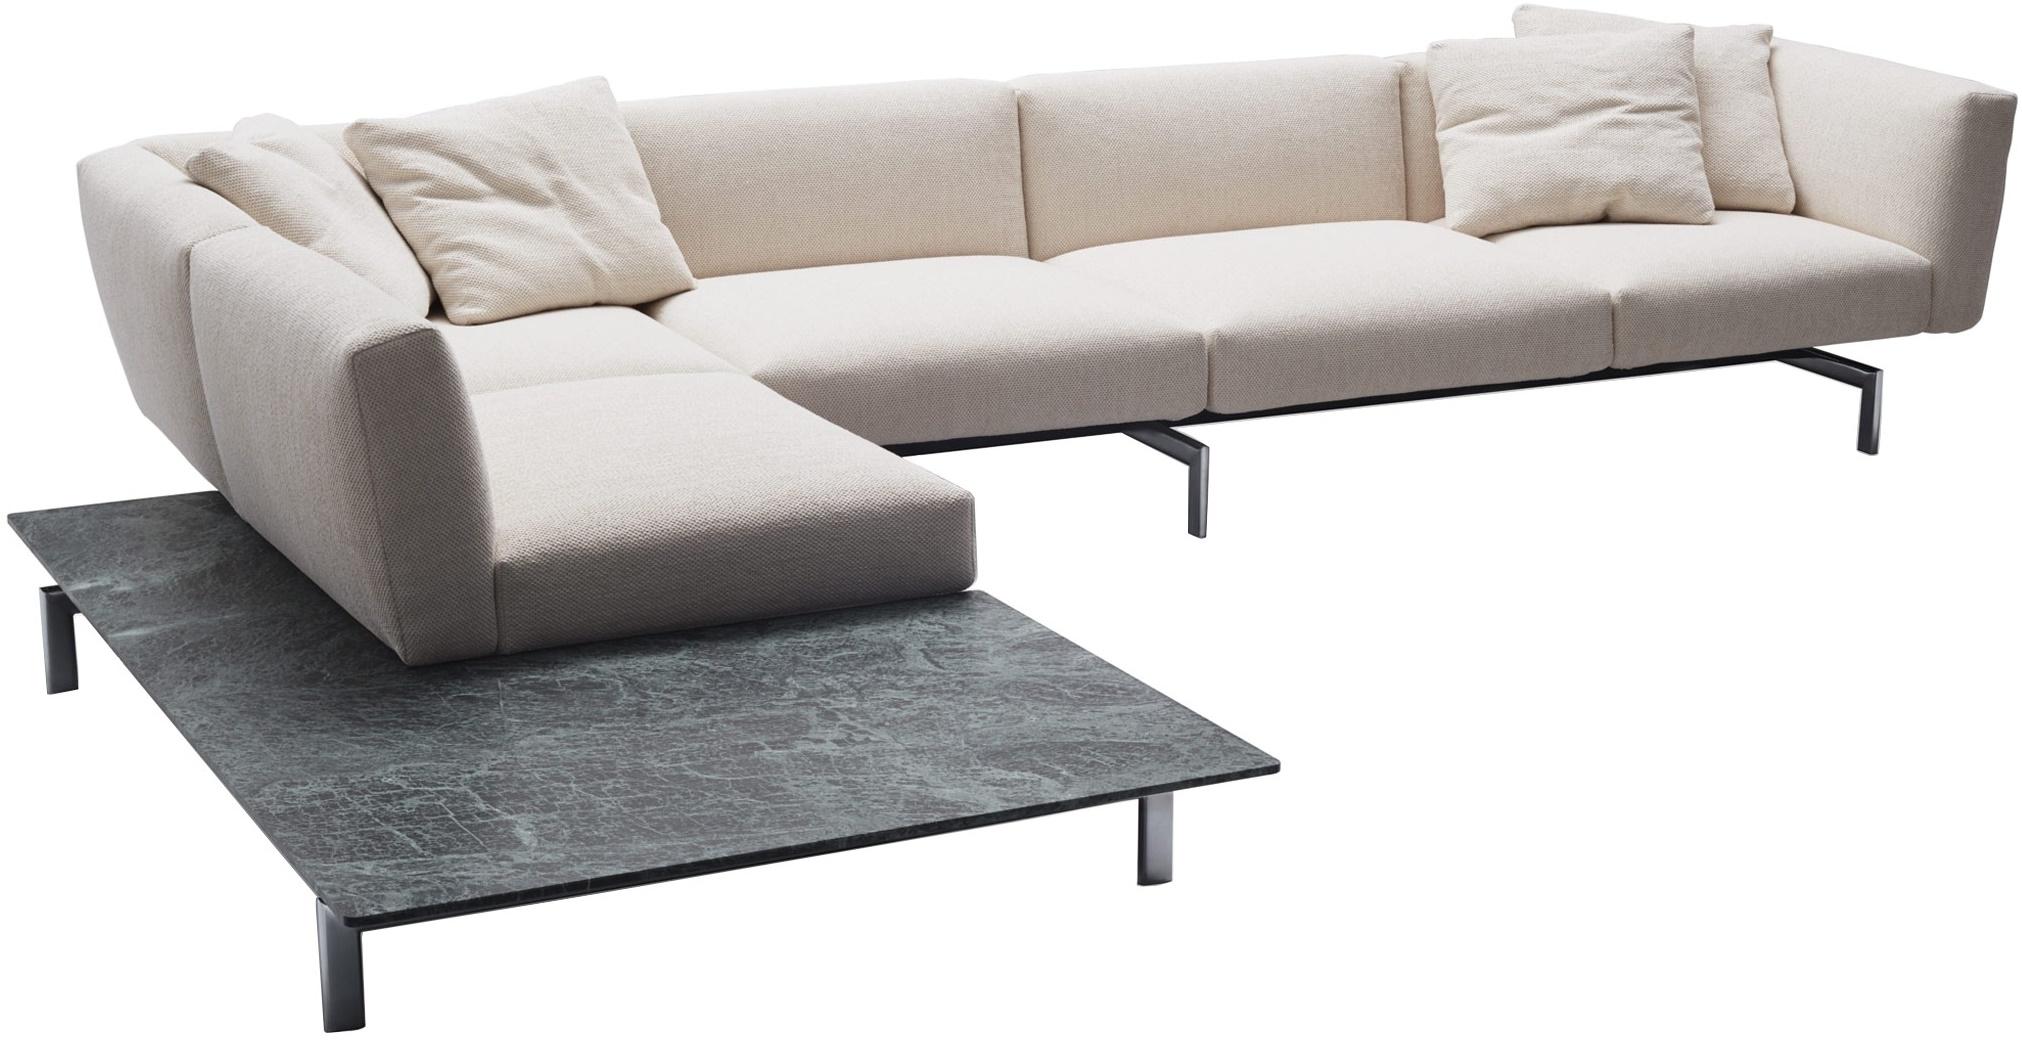 Avio Knoll Sofa System Milia Shop